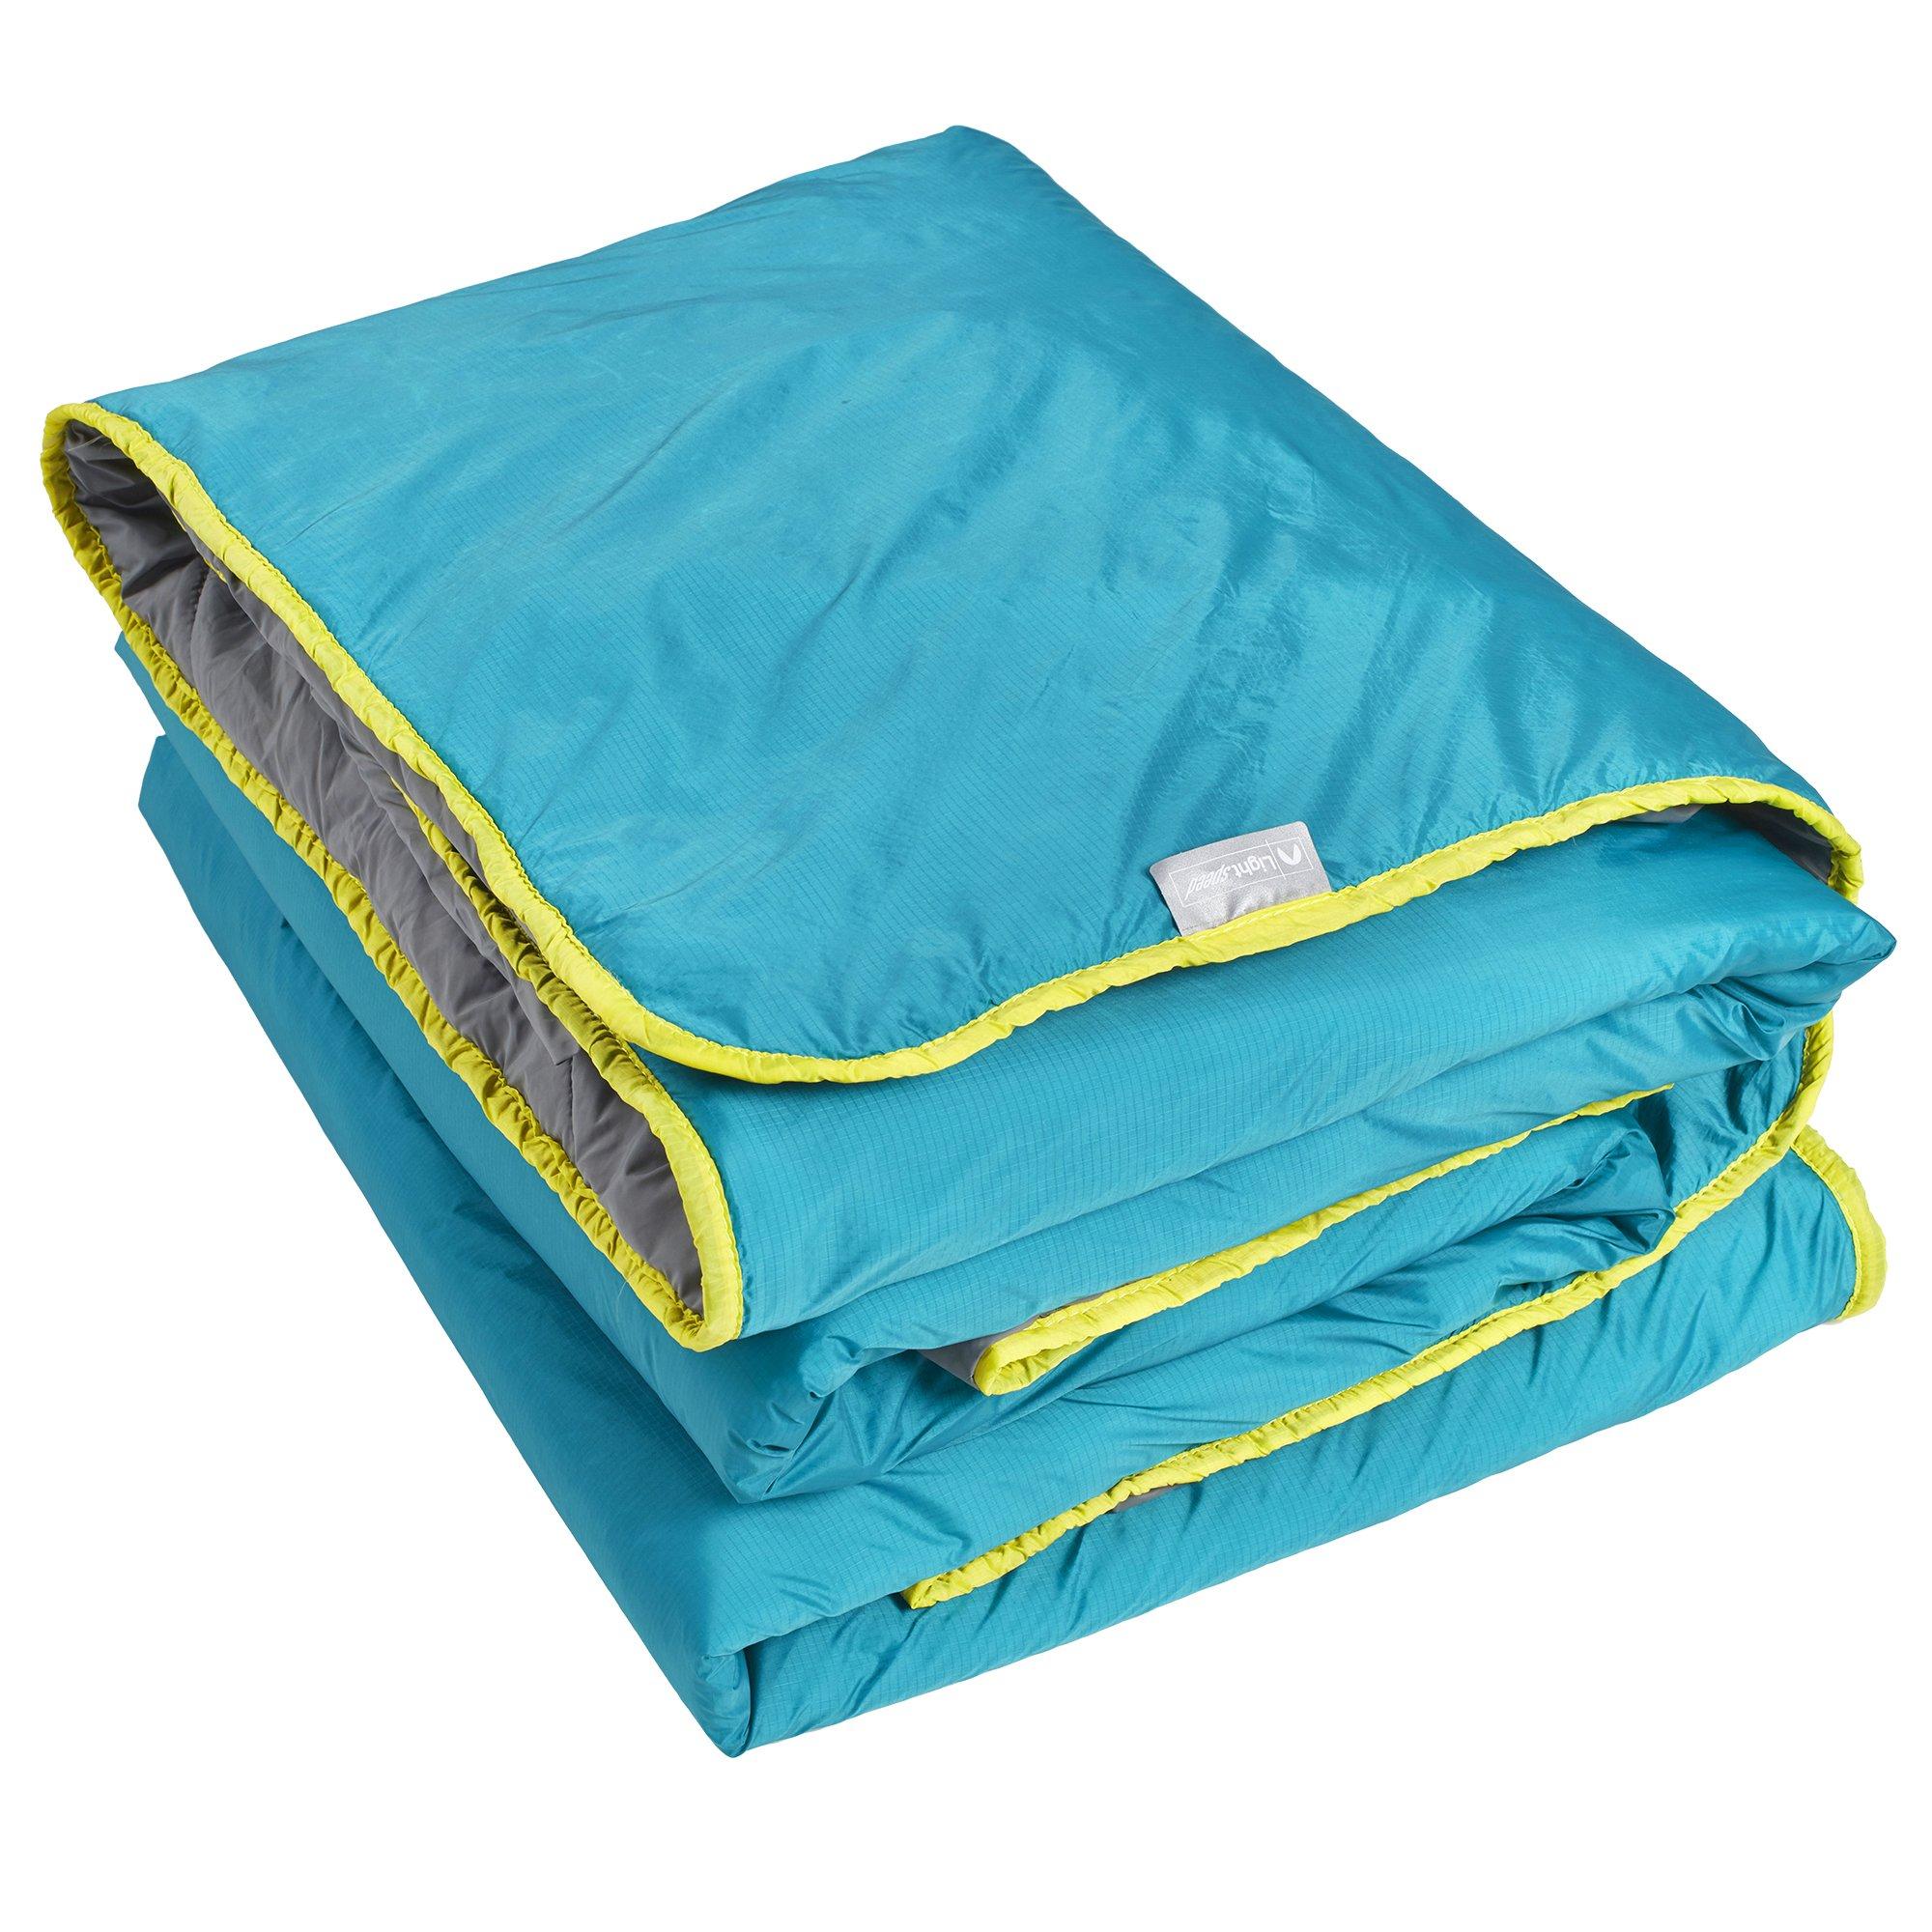 Lightspeed Outdoors Sundown Camp Blanket, Nylon Ripstop, Fluffy Down Alternative, Packable, 77'' x 55''